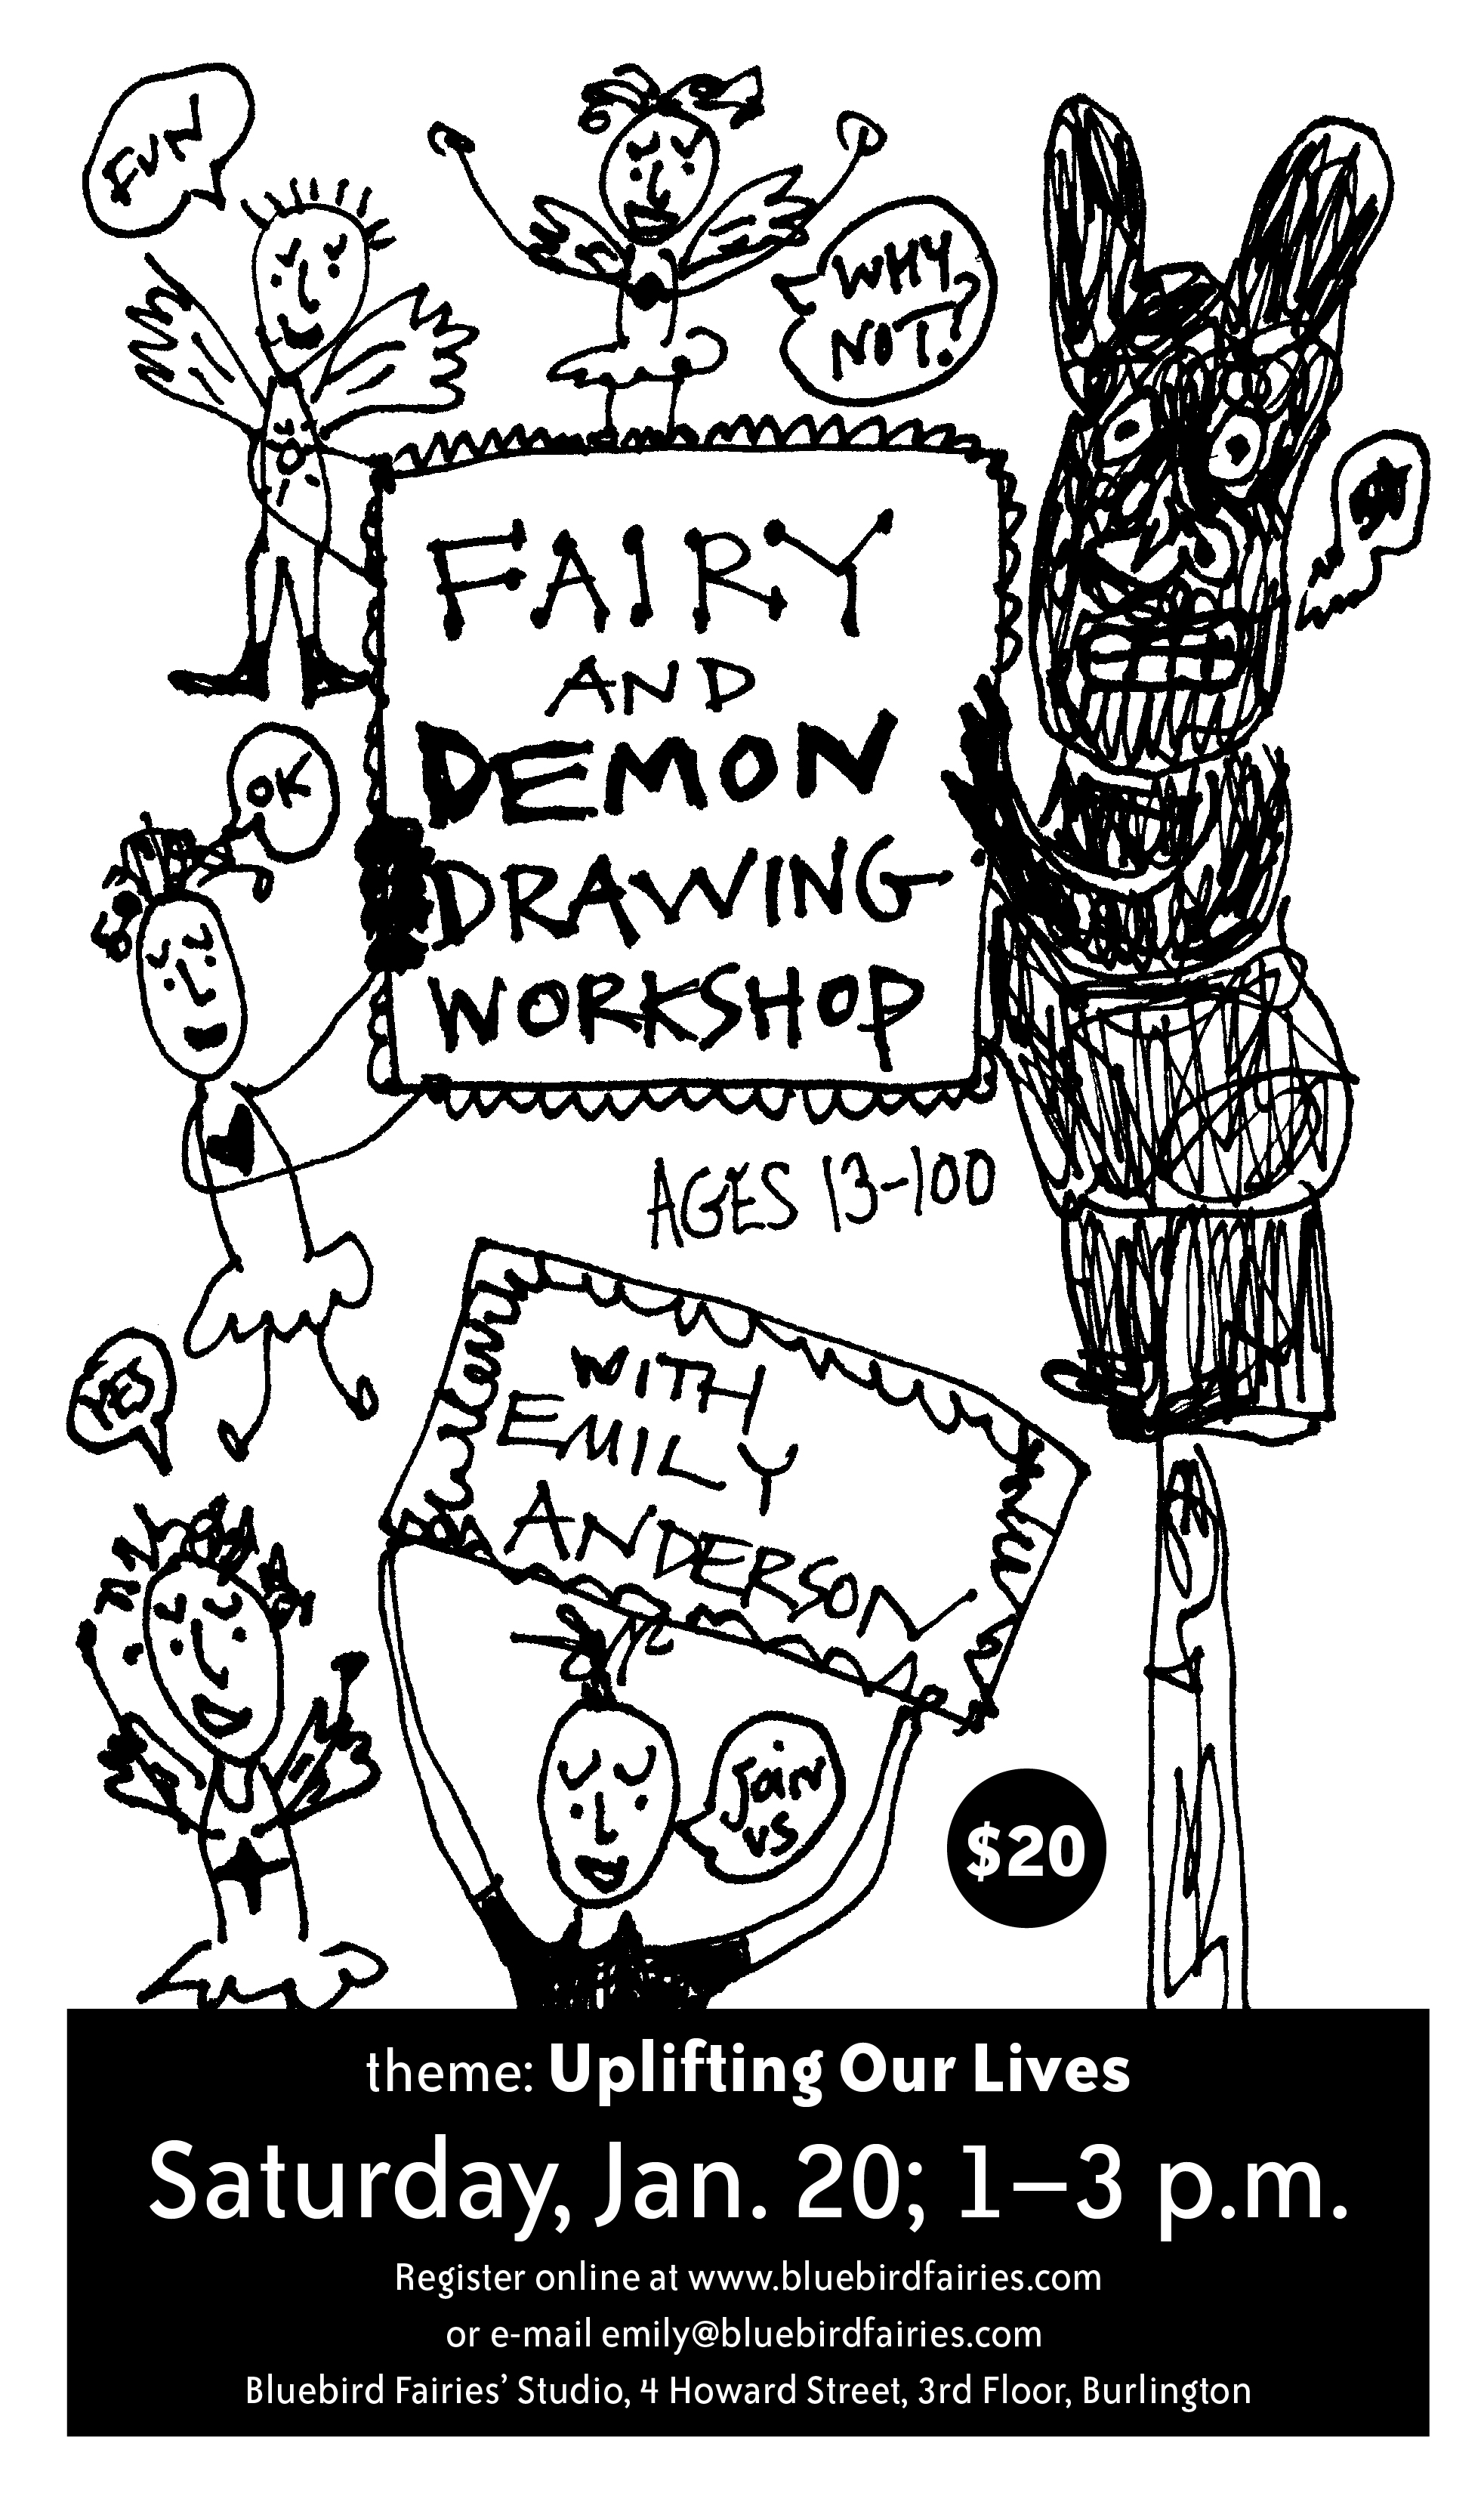 FairyDemonWS_012018_webLg.jpg